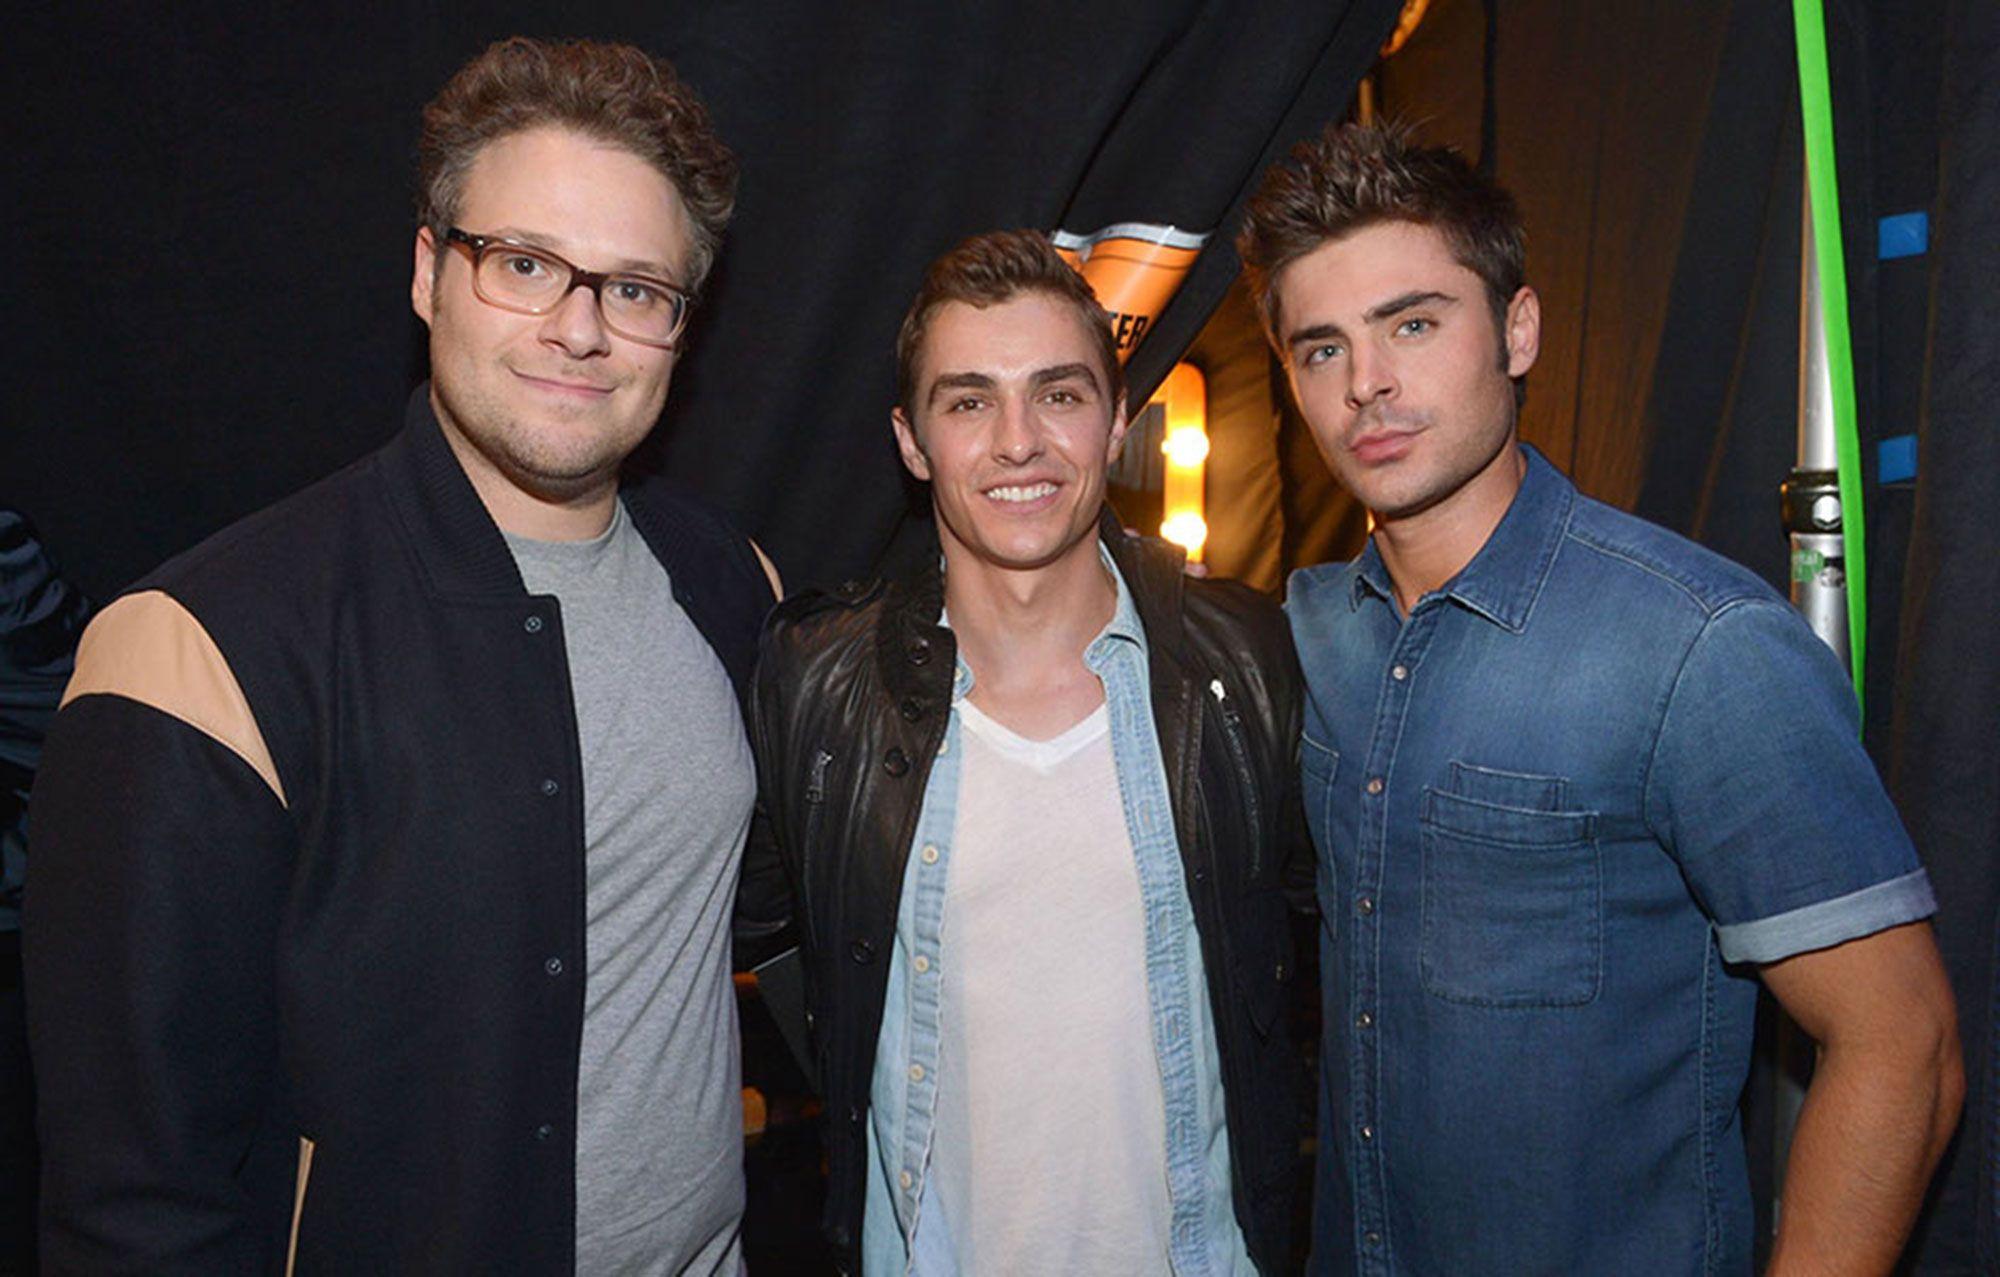 Backstage moments photo gallery movie awards 2014 mtv